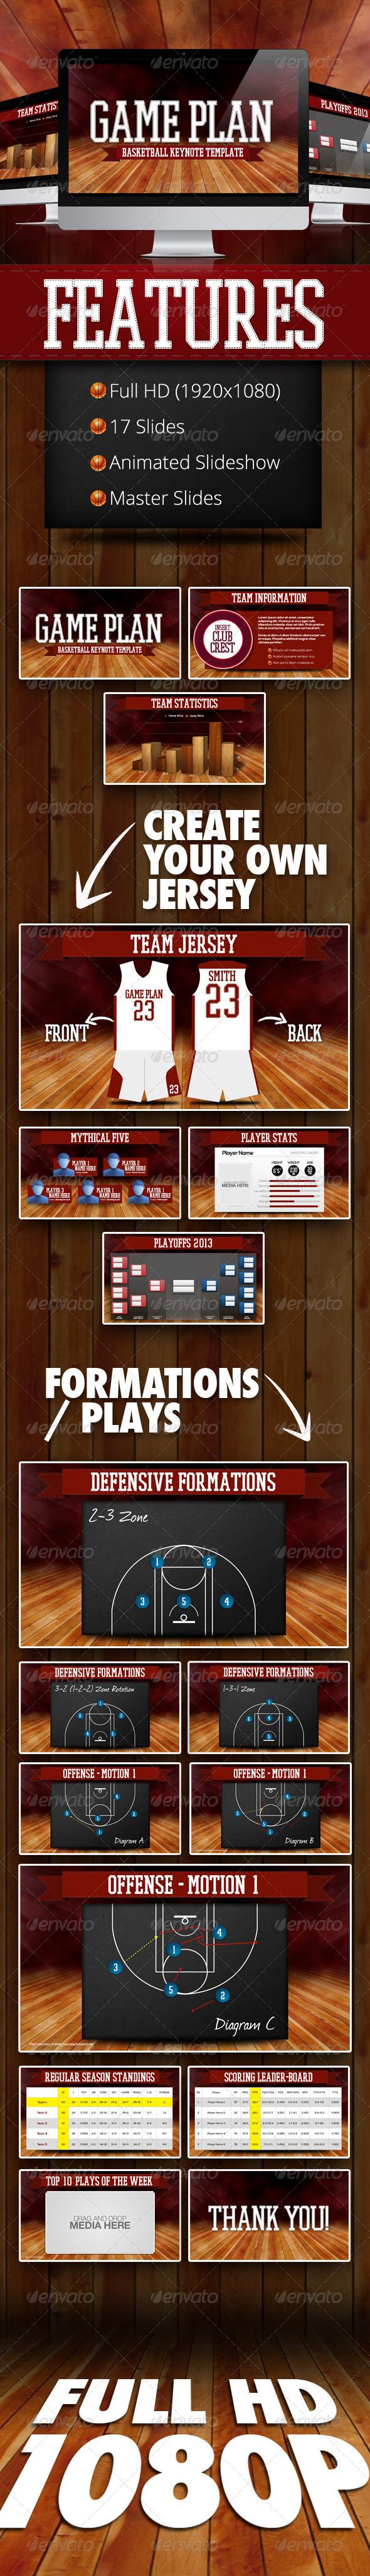 GraphicRiver GAME PLAN Basketball Keynote Template 5421856